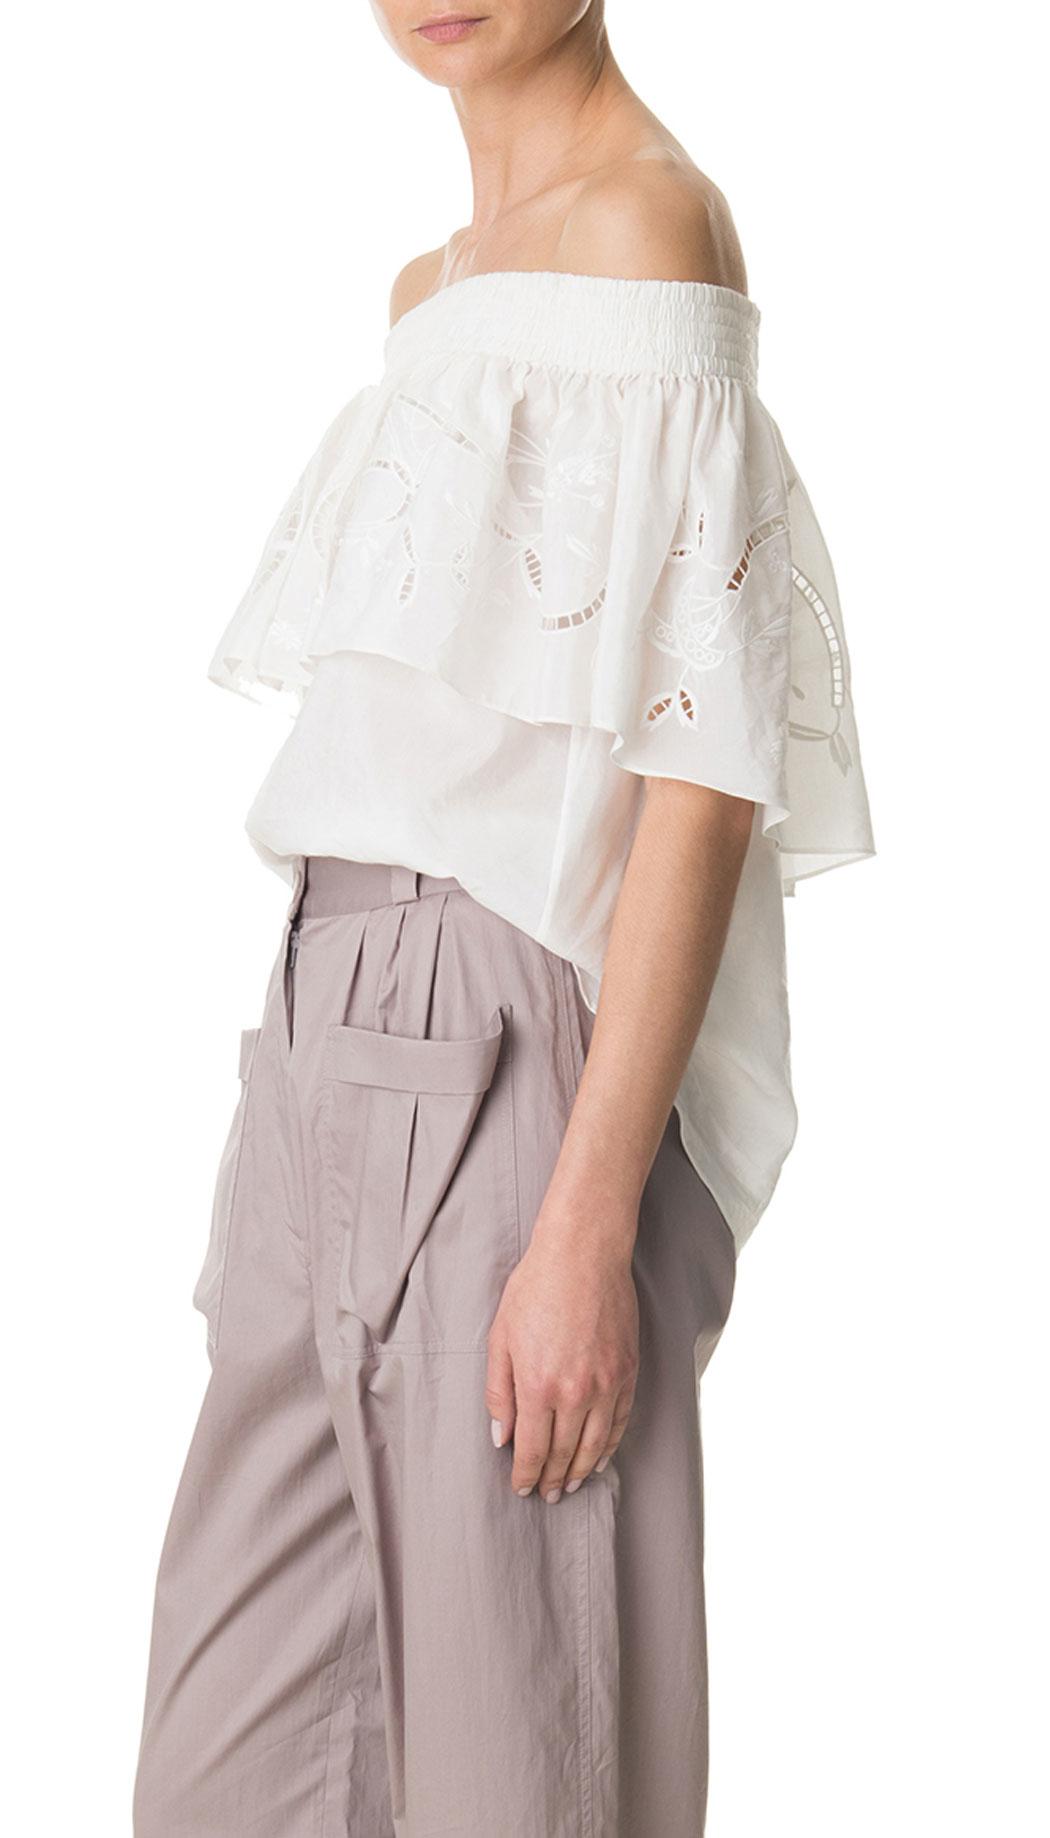 9d2ea7abc1c5e8 Tibi Carmen Embroidery Off-the-shoulder Ruffle Top in White - Lyst